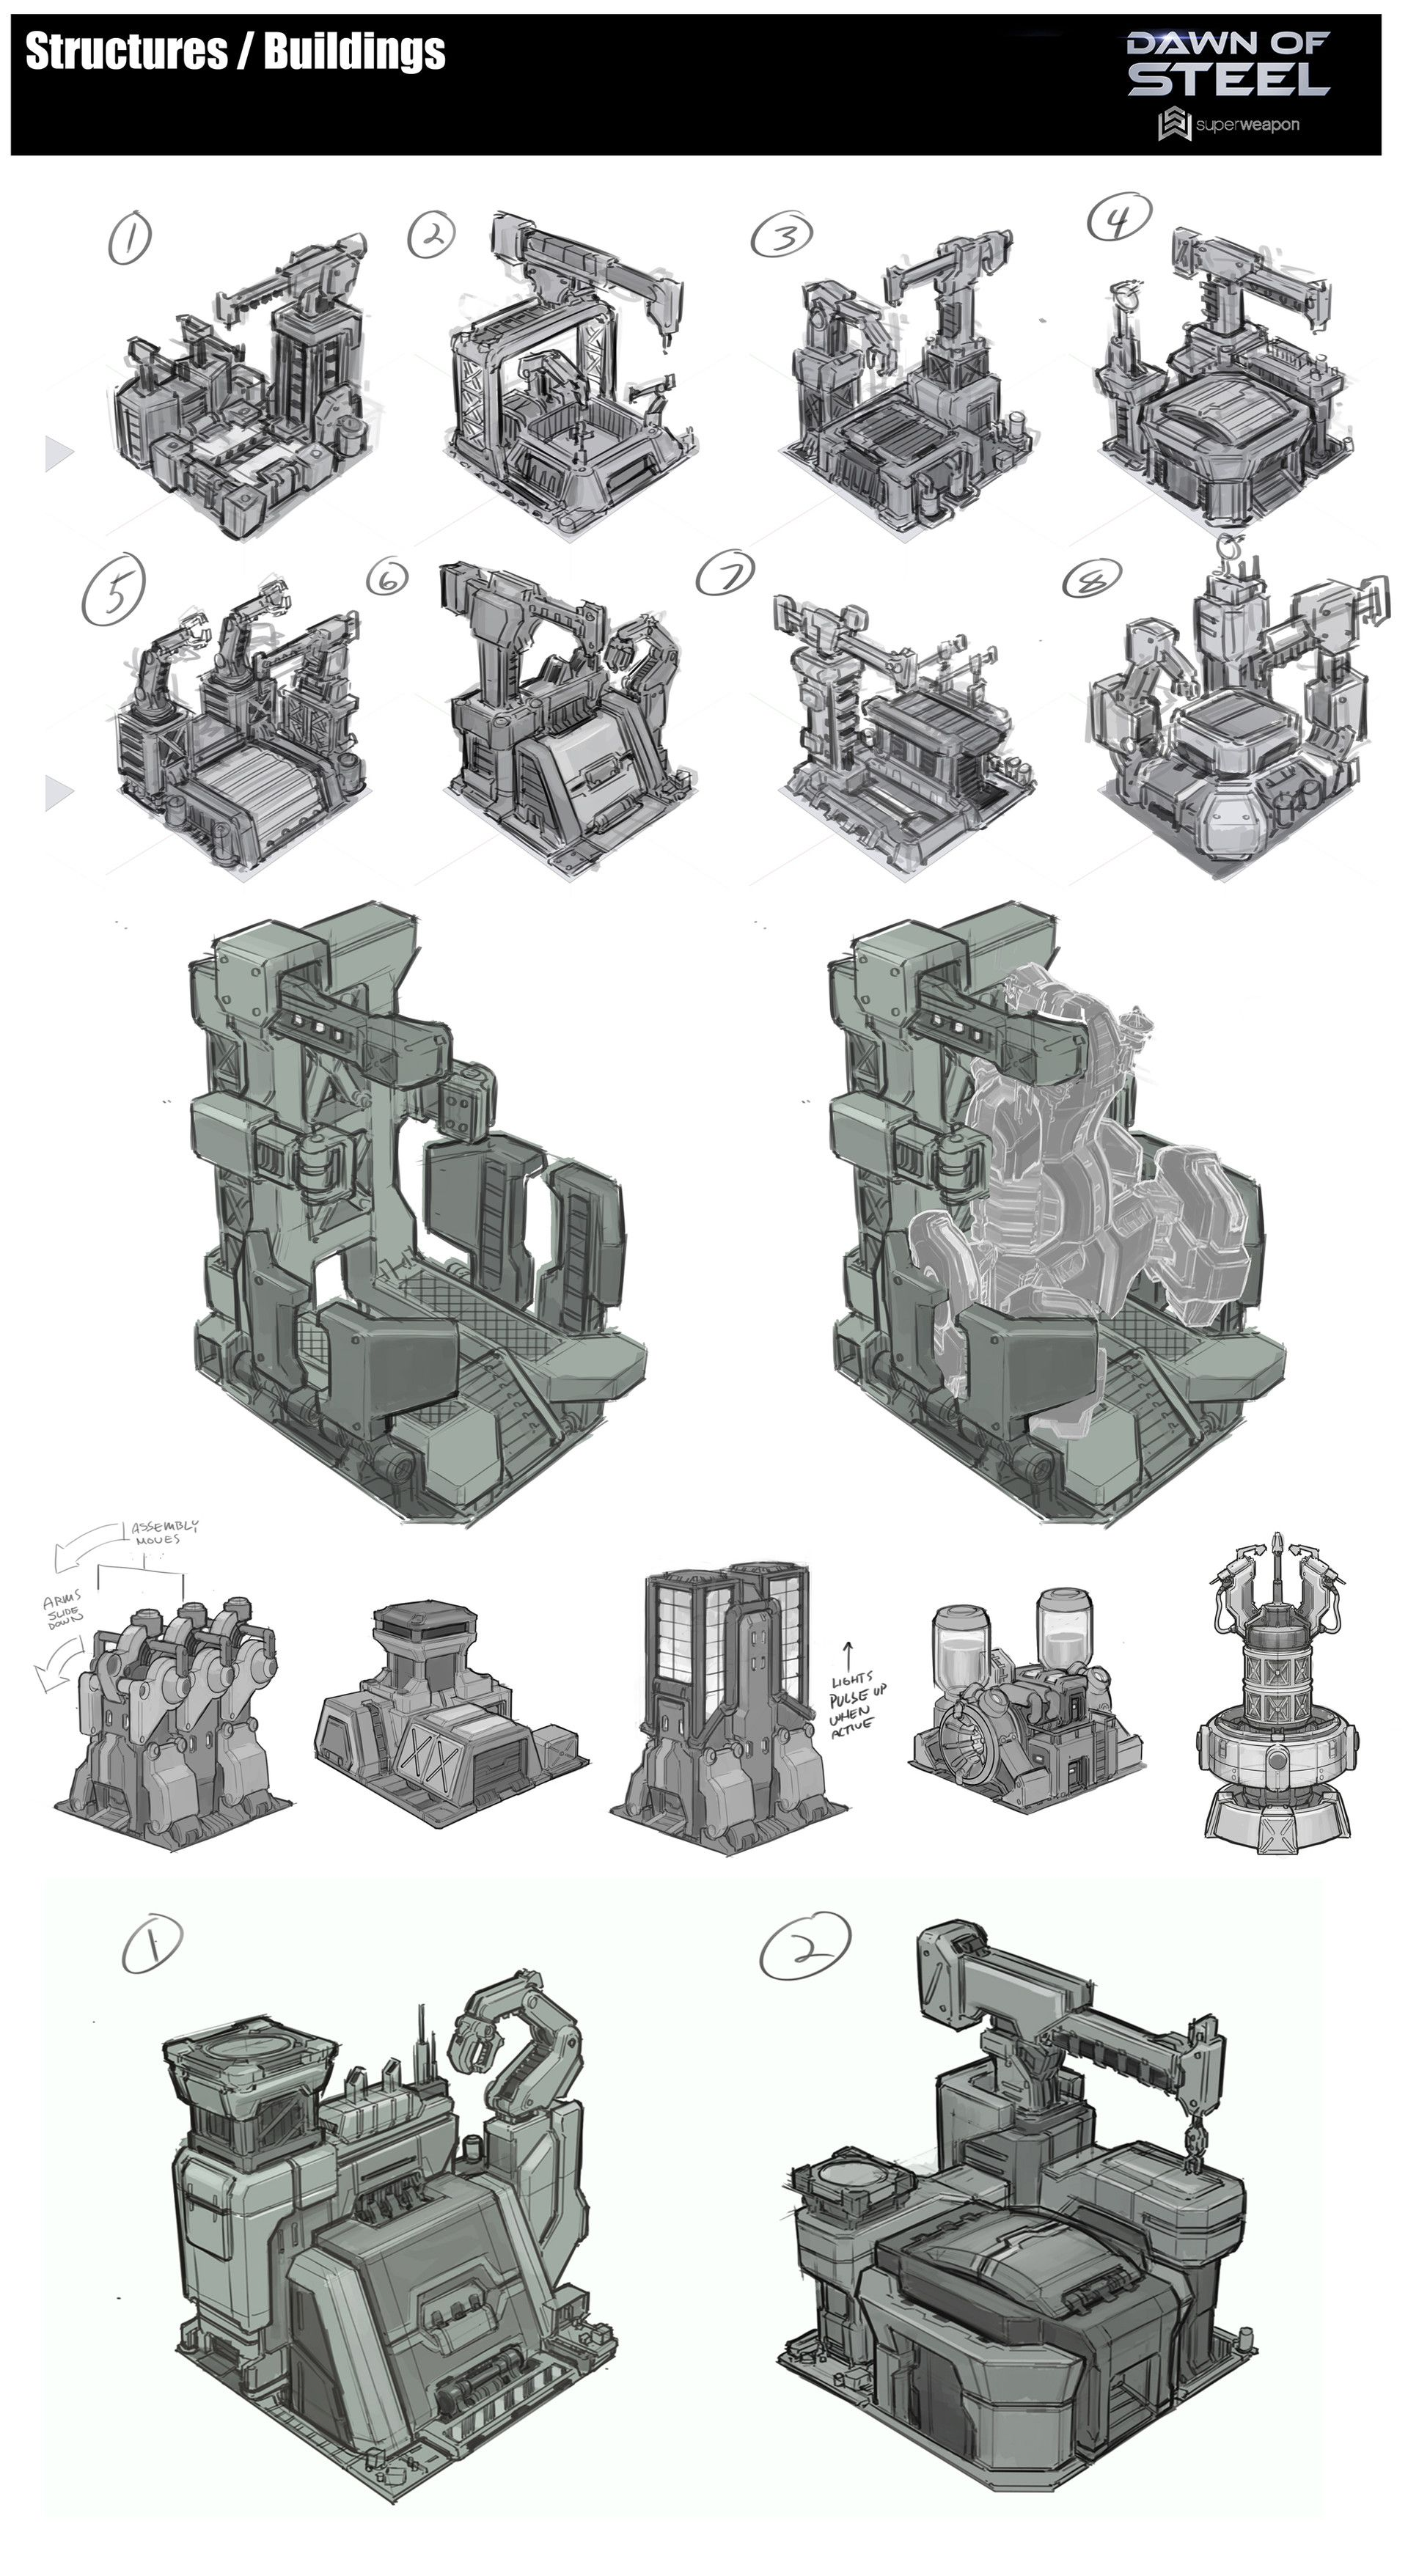 ArtStation - Dawn of Steel - Structures / Buildings ...